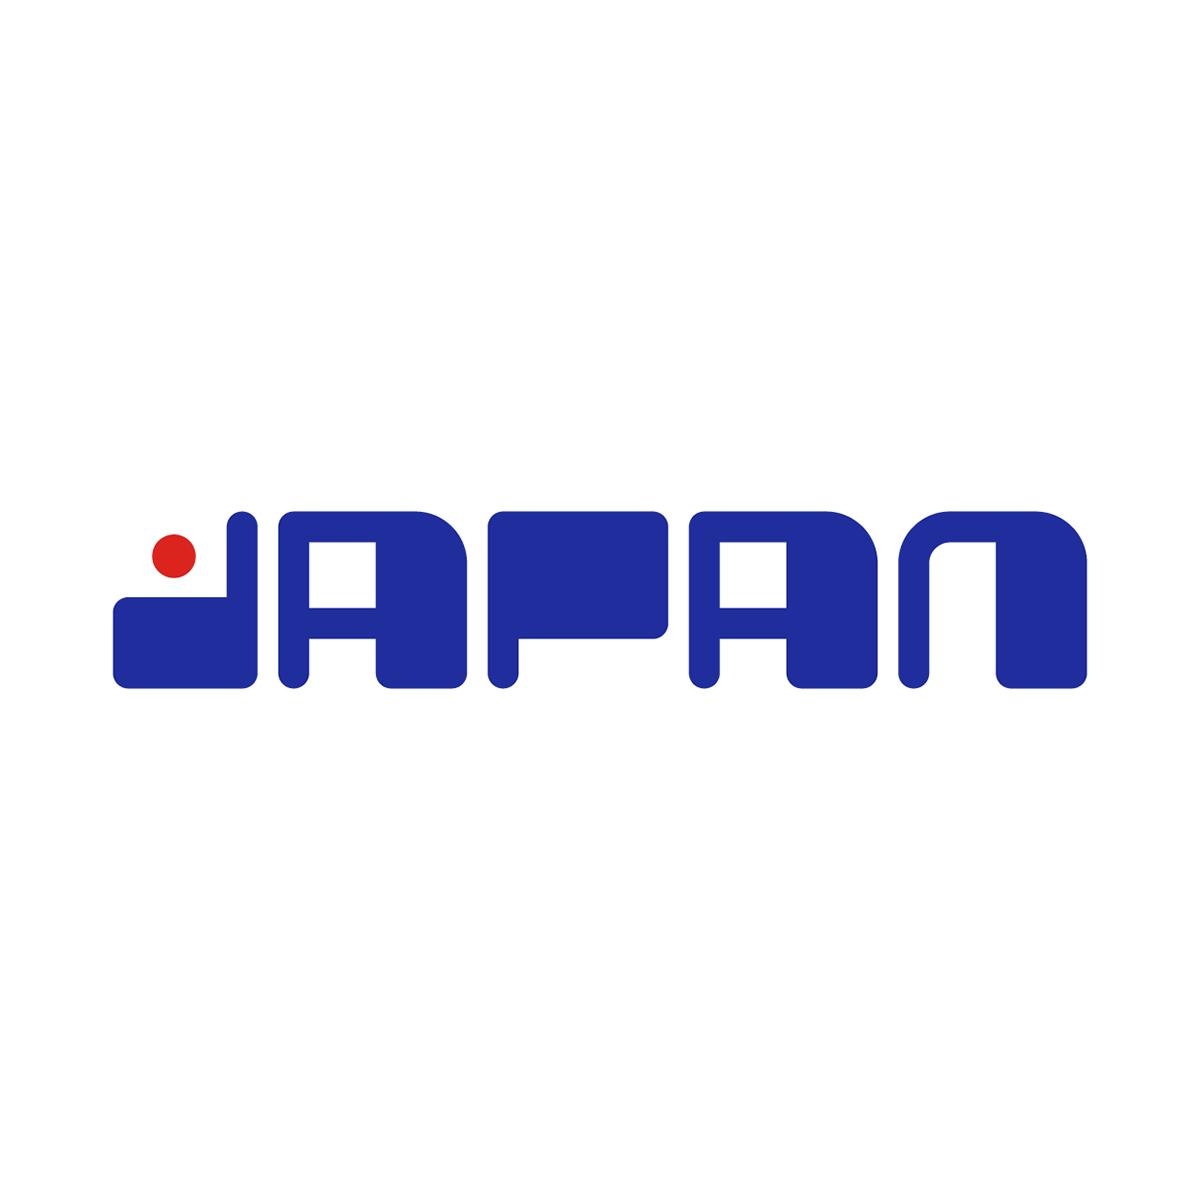 25 de Abril adidas chupa chups Coffee guinness japan nasa Netflix POLAROID sunday